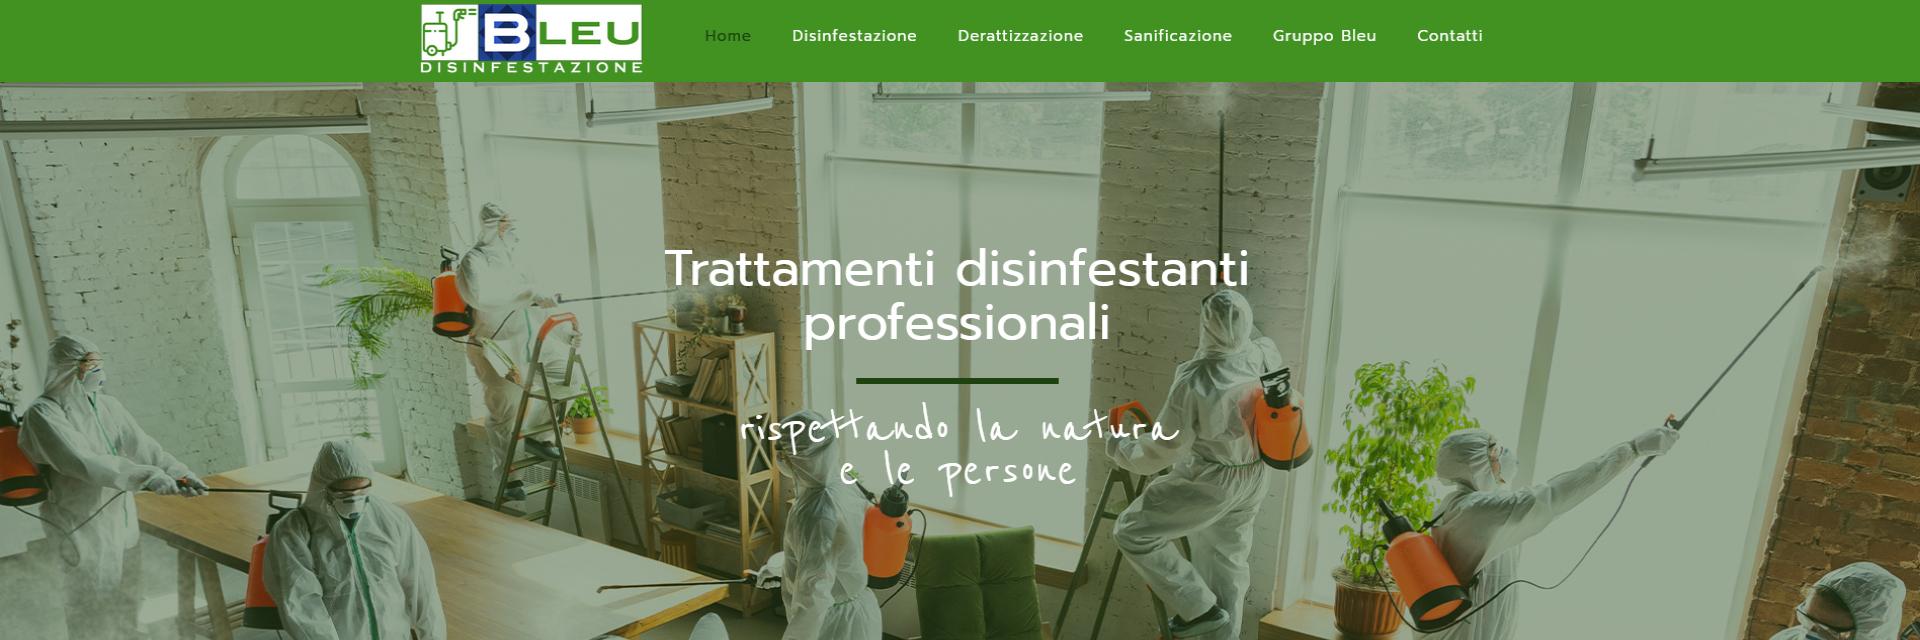 1920x640_screen_www-bleudisinfestazione-1